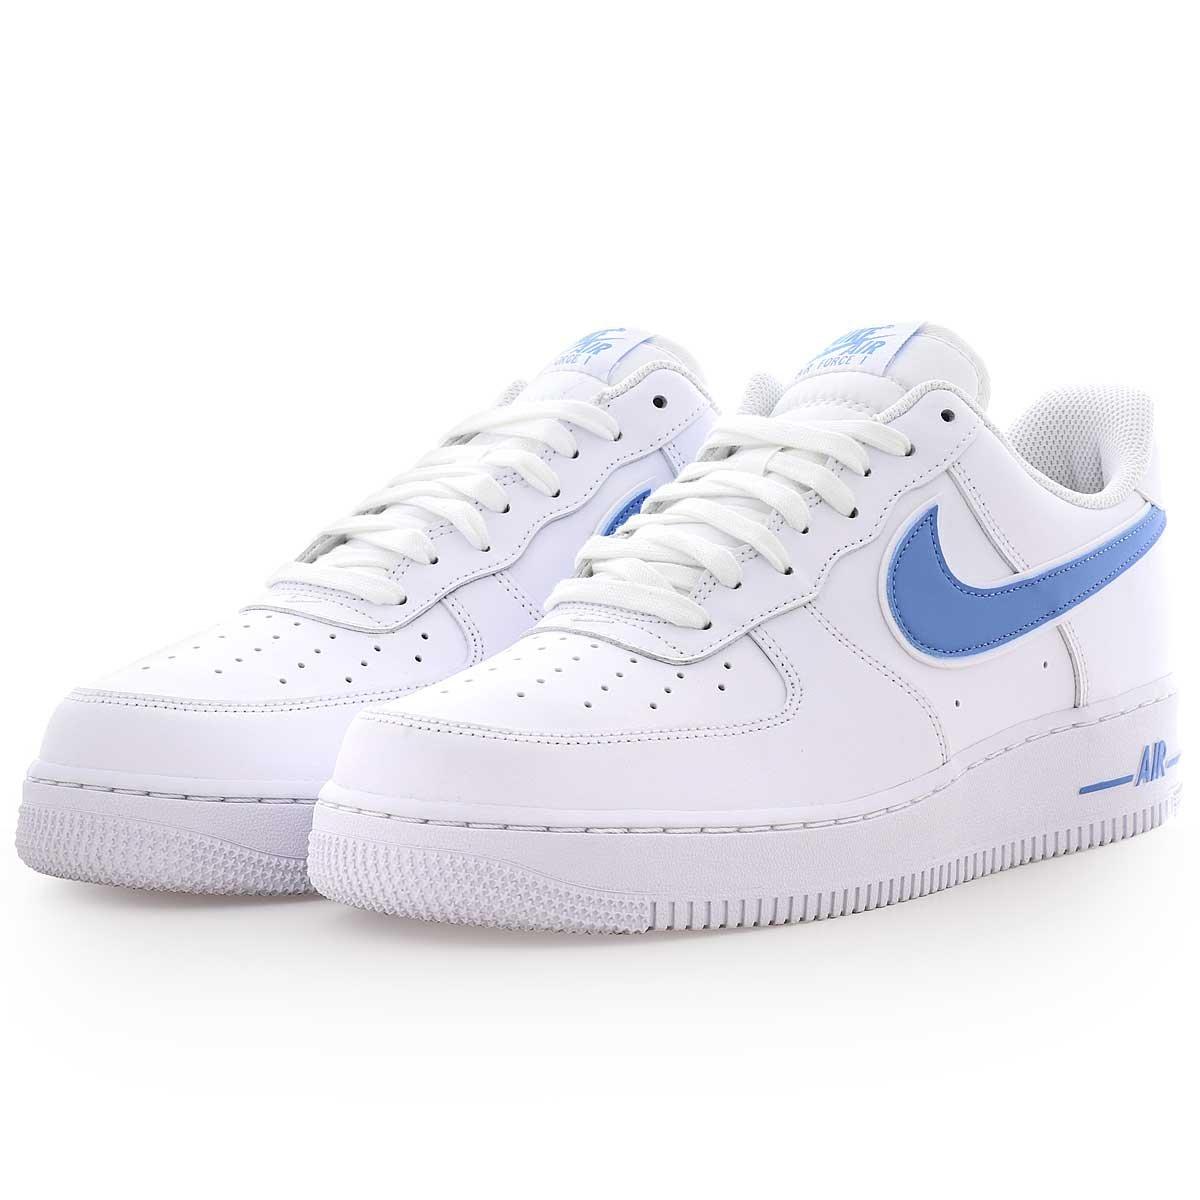 Custom coloured Nike tick airforce 1s